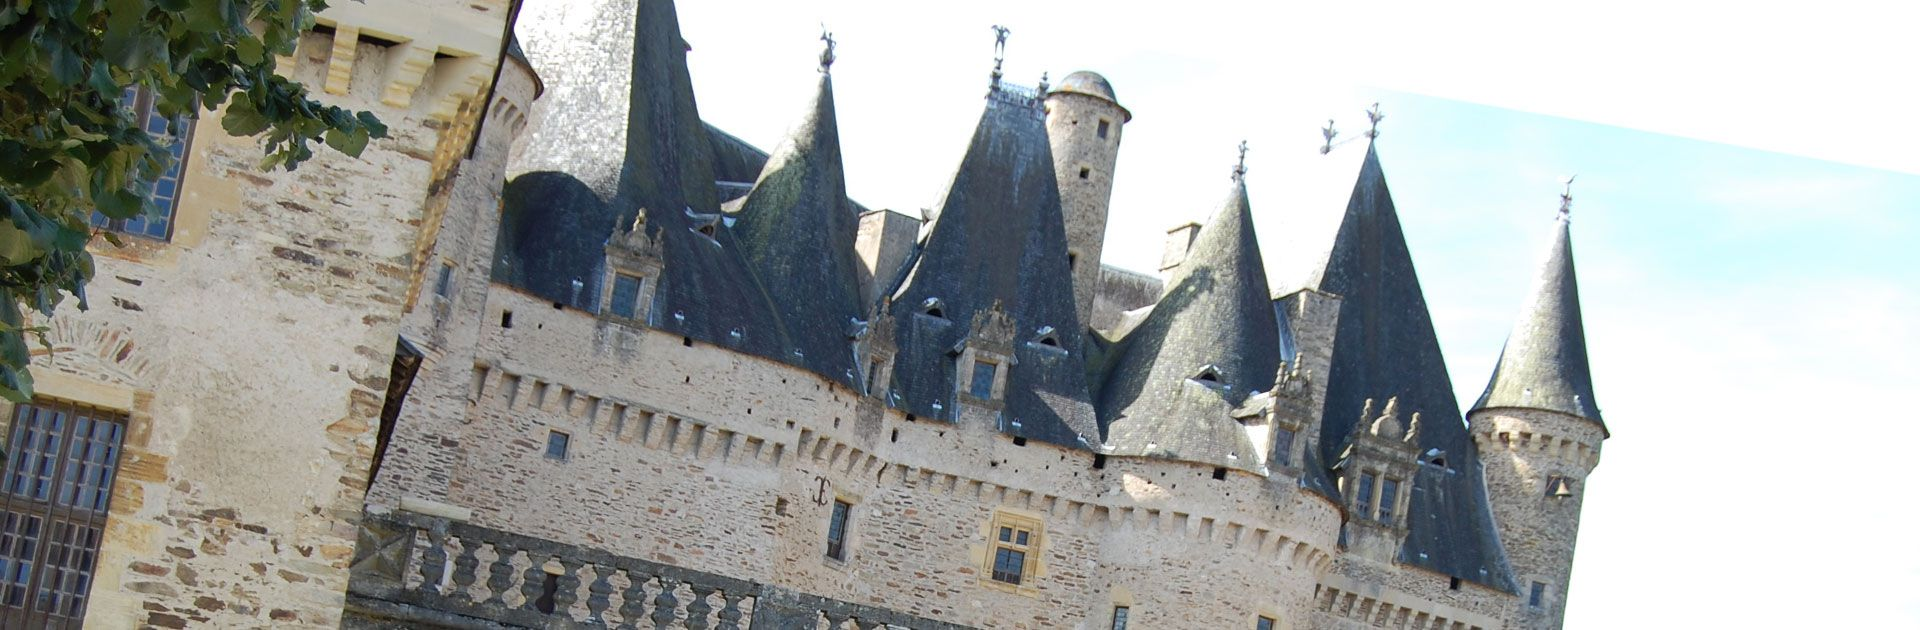 Château de Jumilhac Goud Tuin Groen Périgord Vert